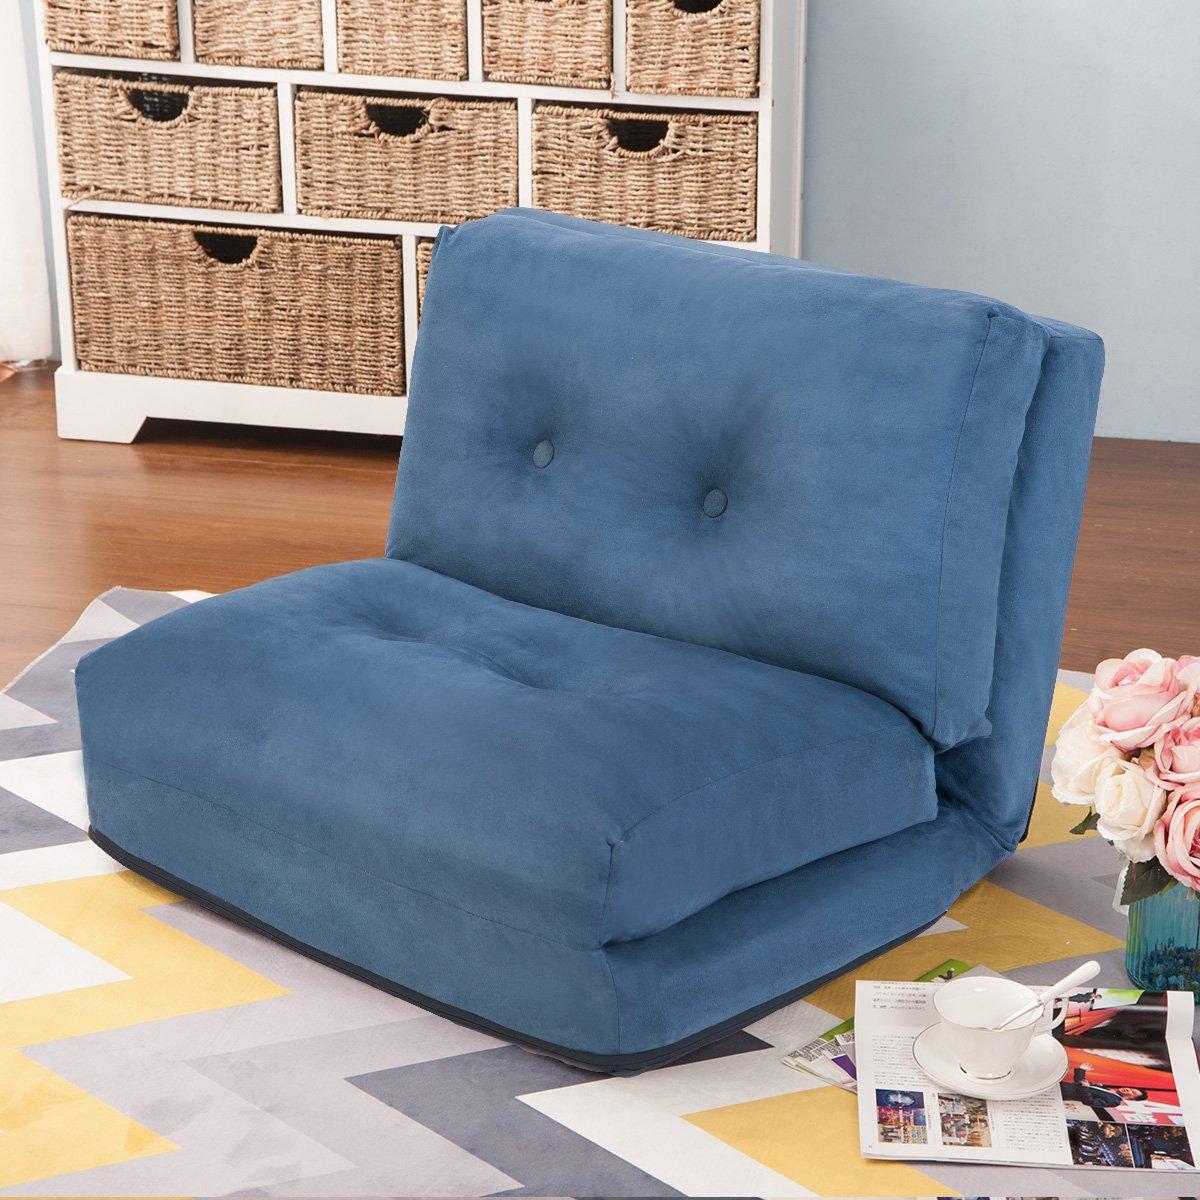 Harper&Bright Designs 038829 Floor Chair